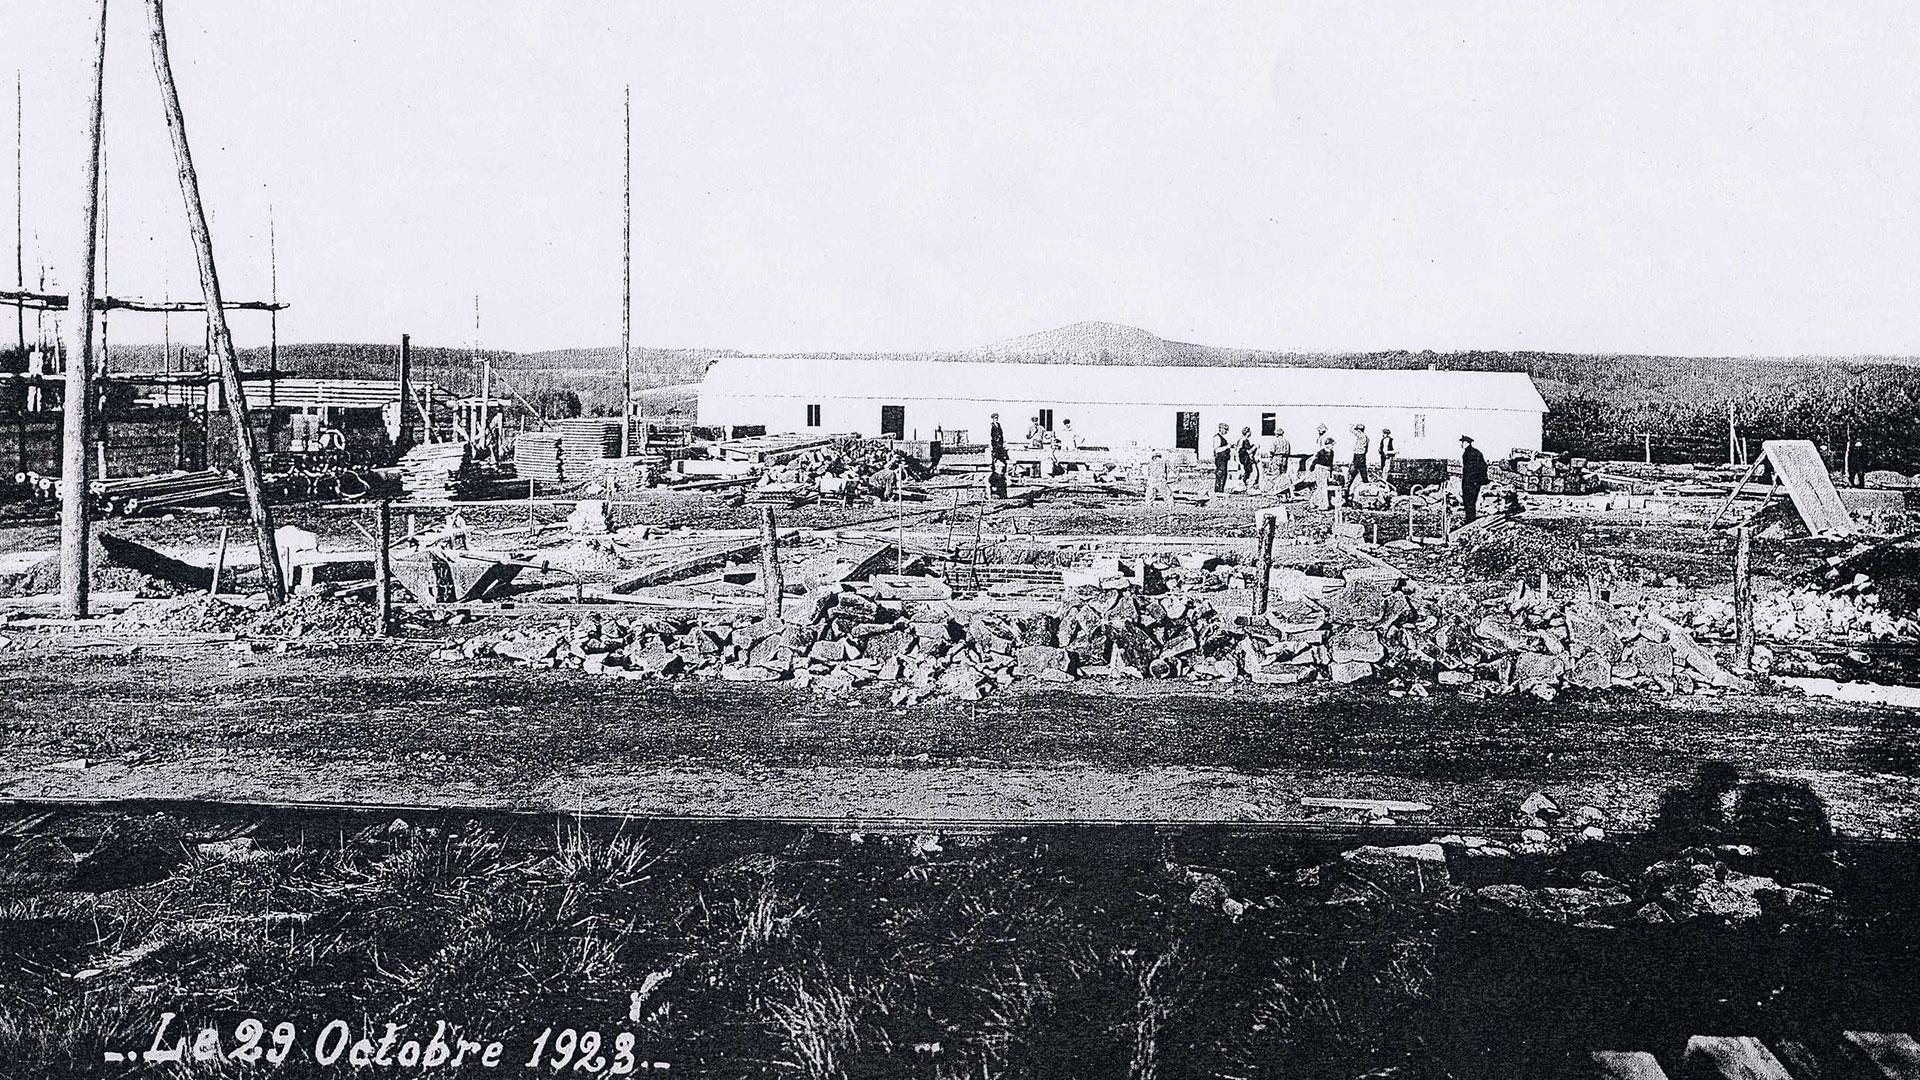 histoire-mine de Messeix -chantier en octobre 1923-